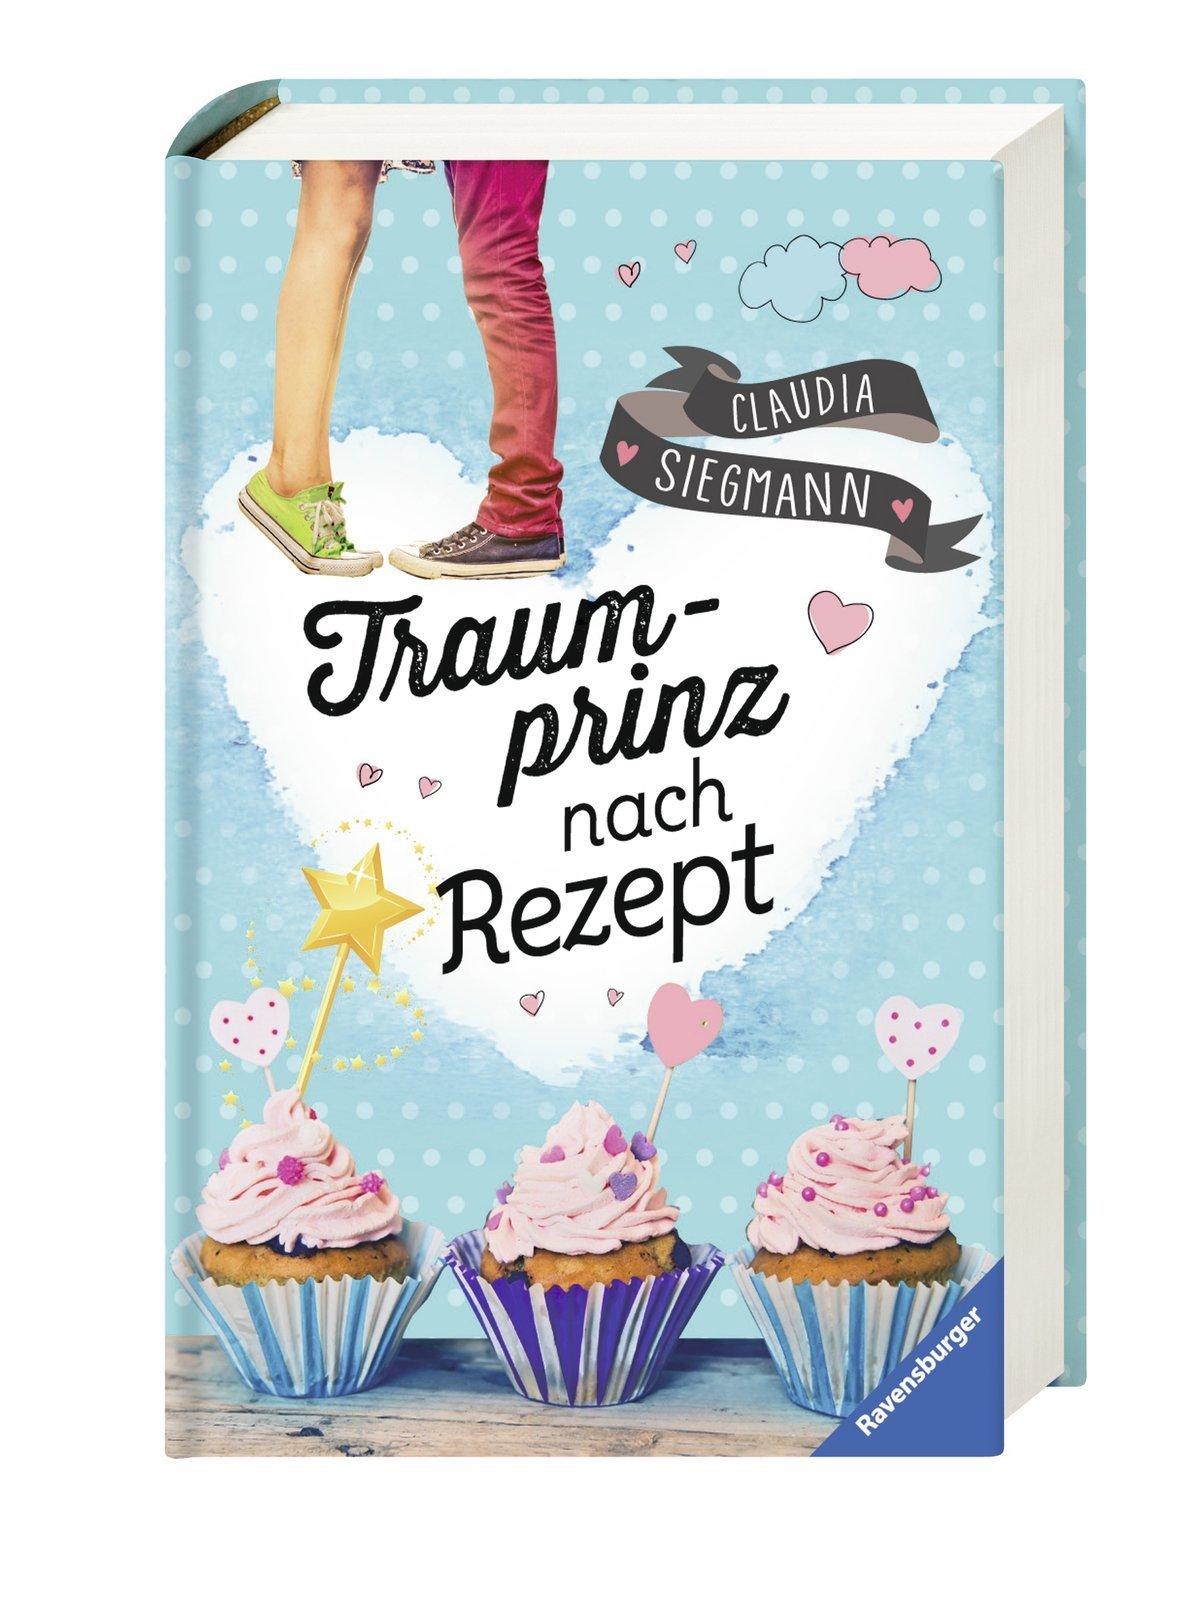 Traumprinz nach Rezept Claudia Siegmann